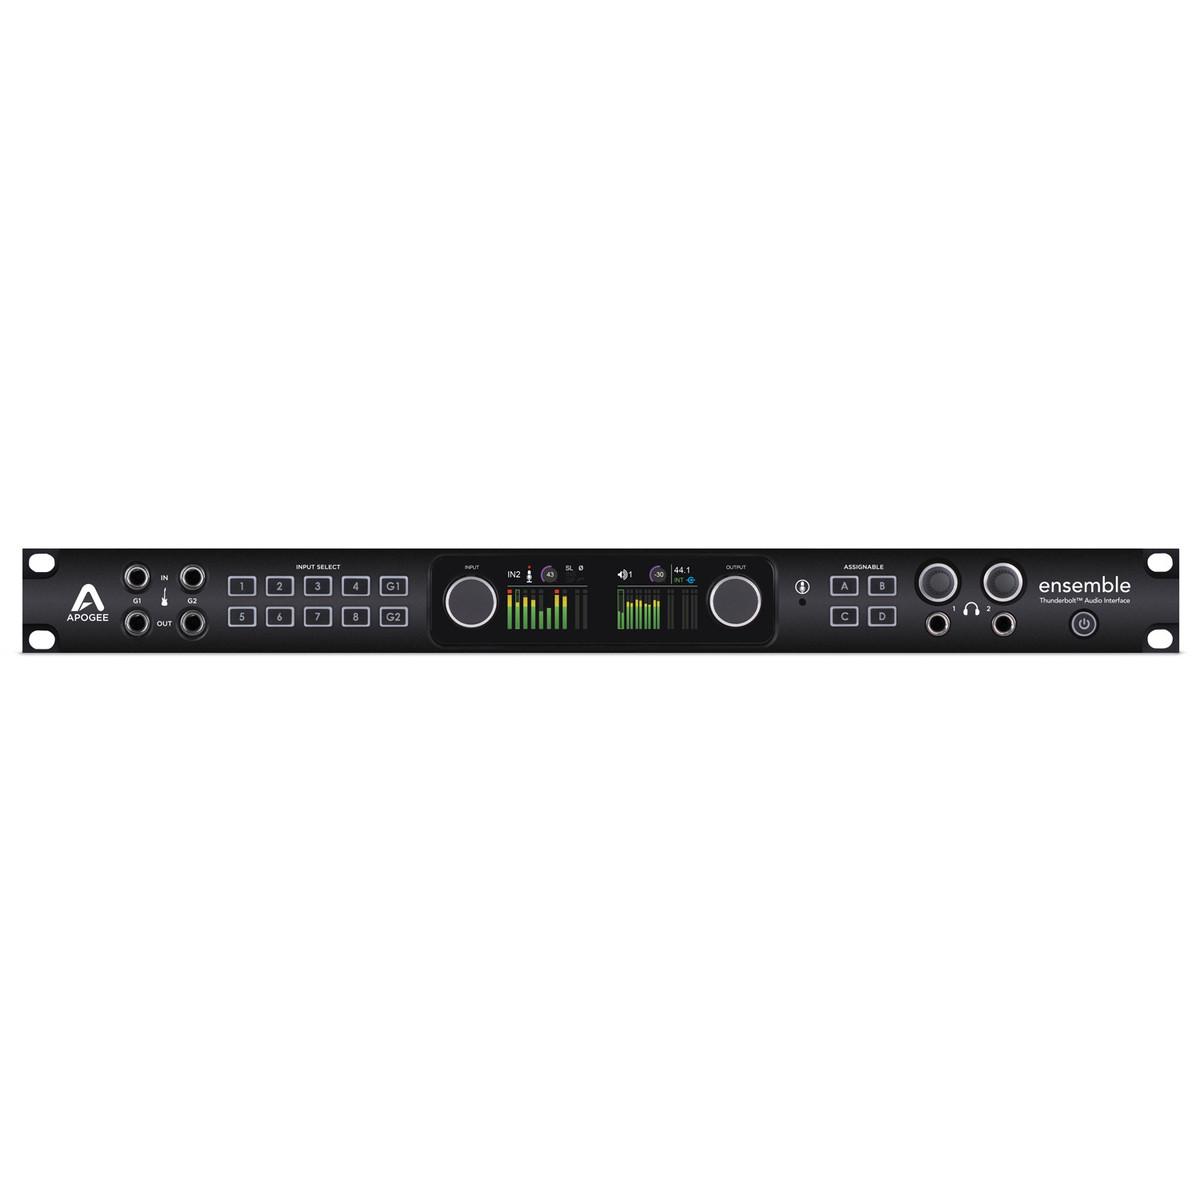 apogee ensemble 30x34 thunderbolt audio interface at gear4music. Black Bedroom Furniture Sets. Home Design Ideas